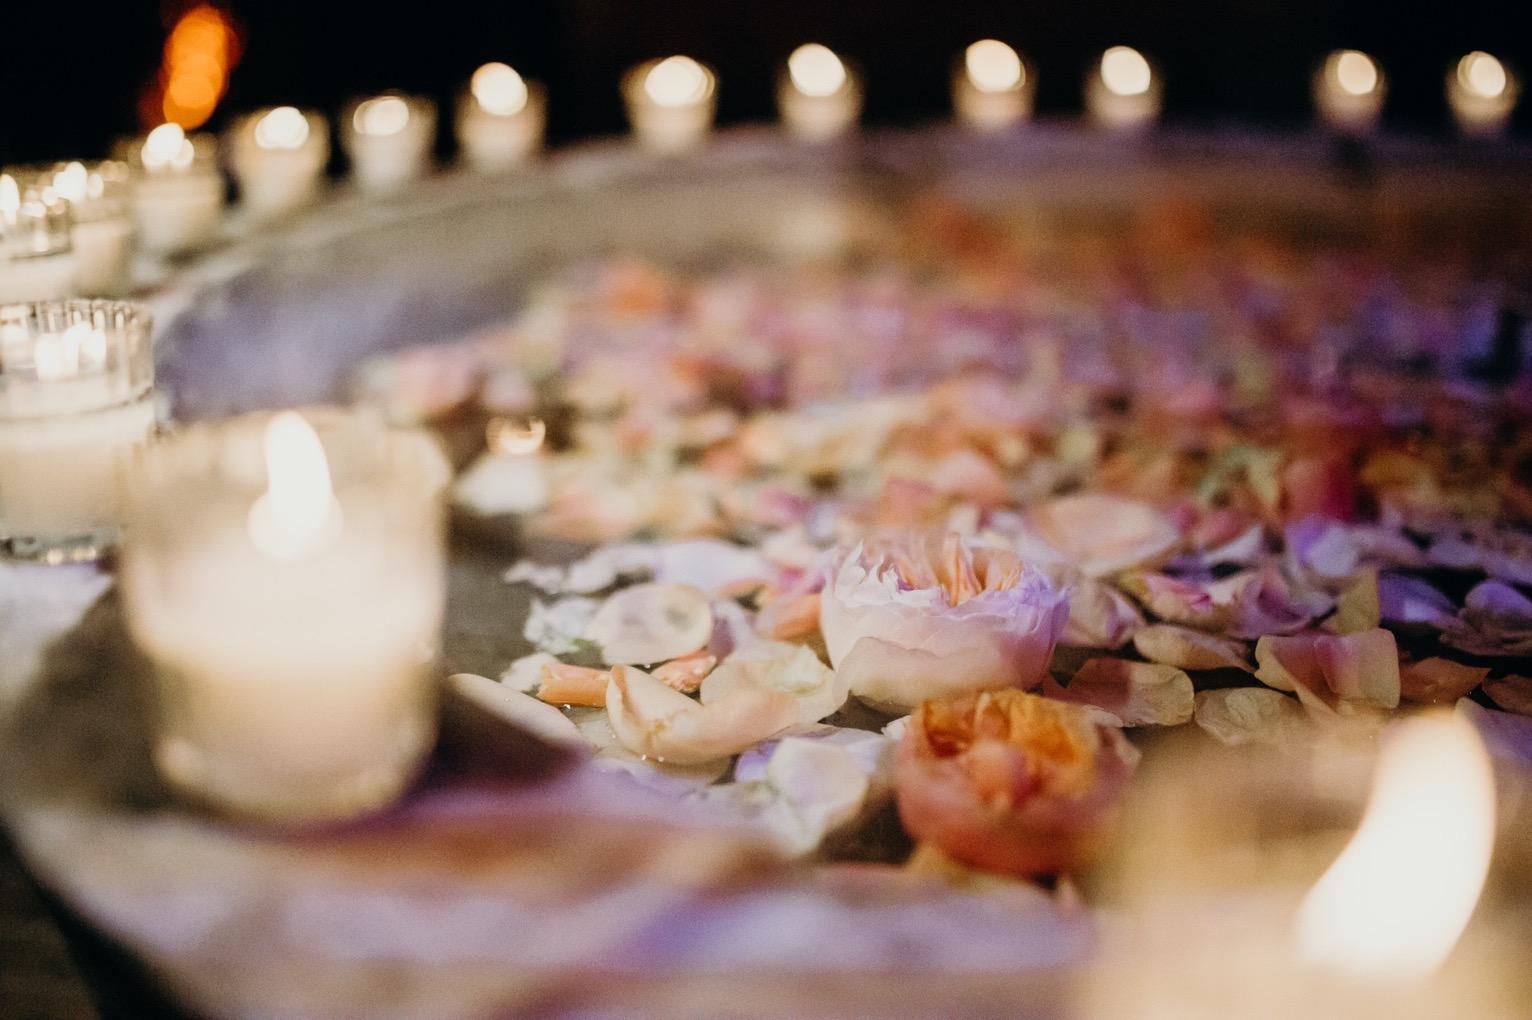 Si-Quiero-Wedding-Planner-By-Sira-Antequera-Bodas-Málaga-Marbella-Miami- L-A-23